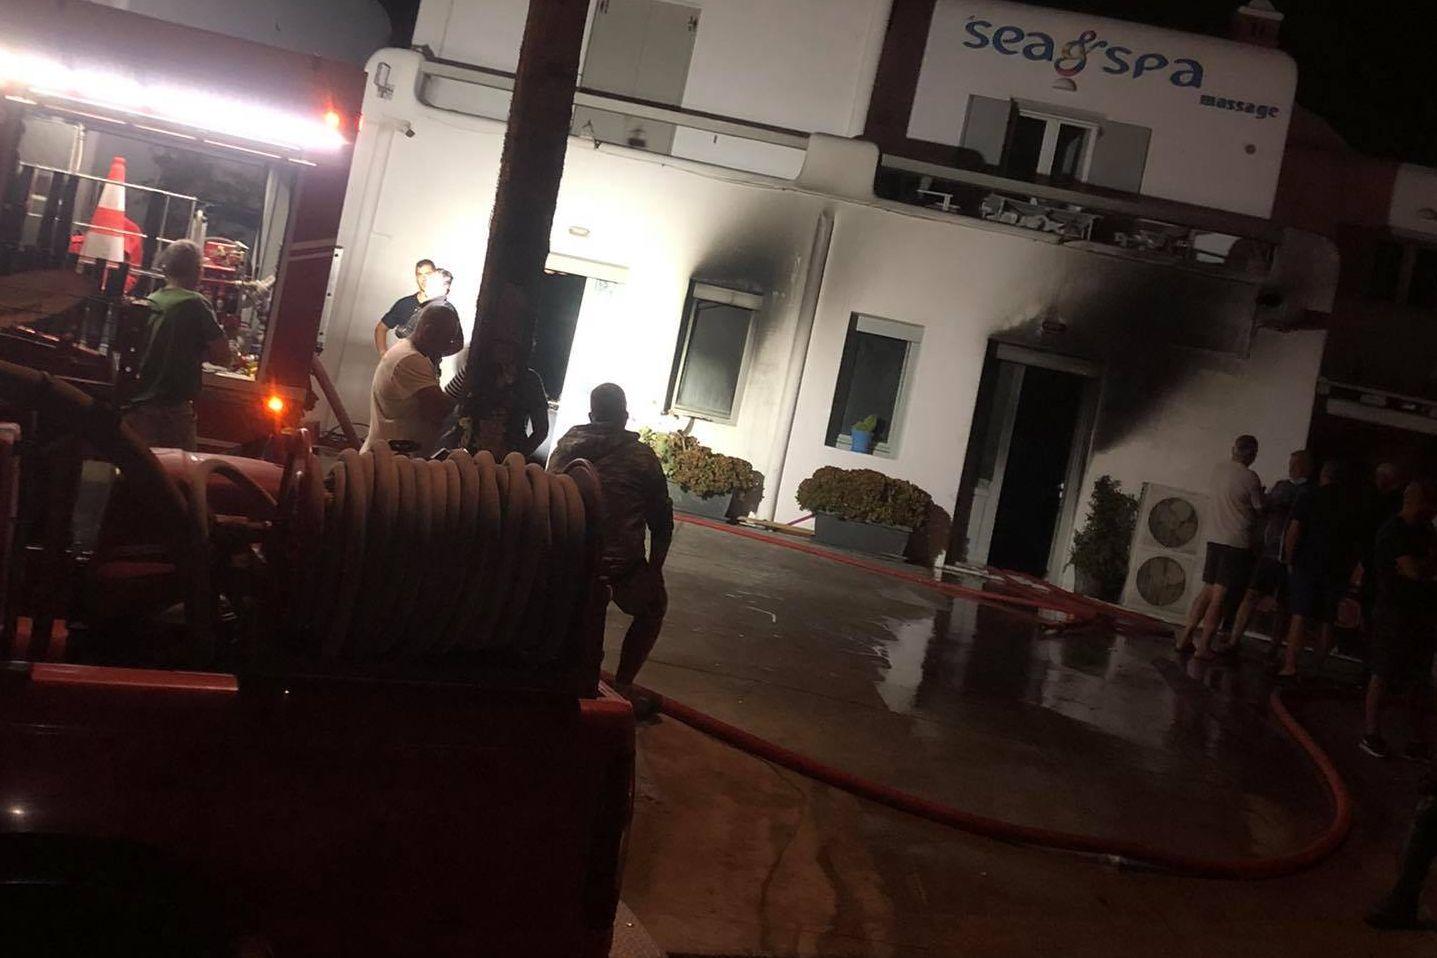 (pics) Υπό έλεγχο η πυρκαγιά - Καταστράφηκε ολοσχερώς το κατάστημα στον Ορνό